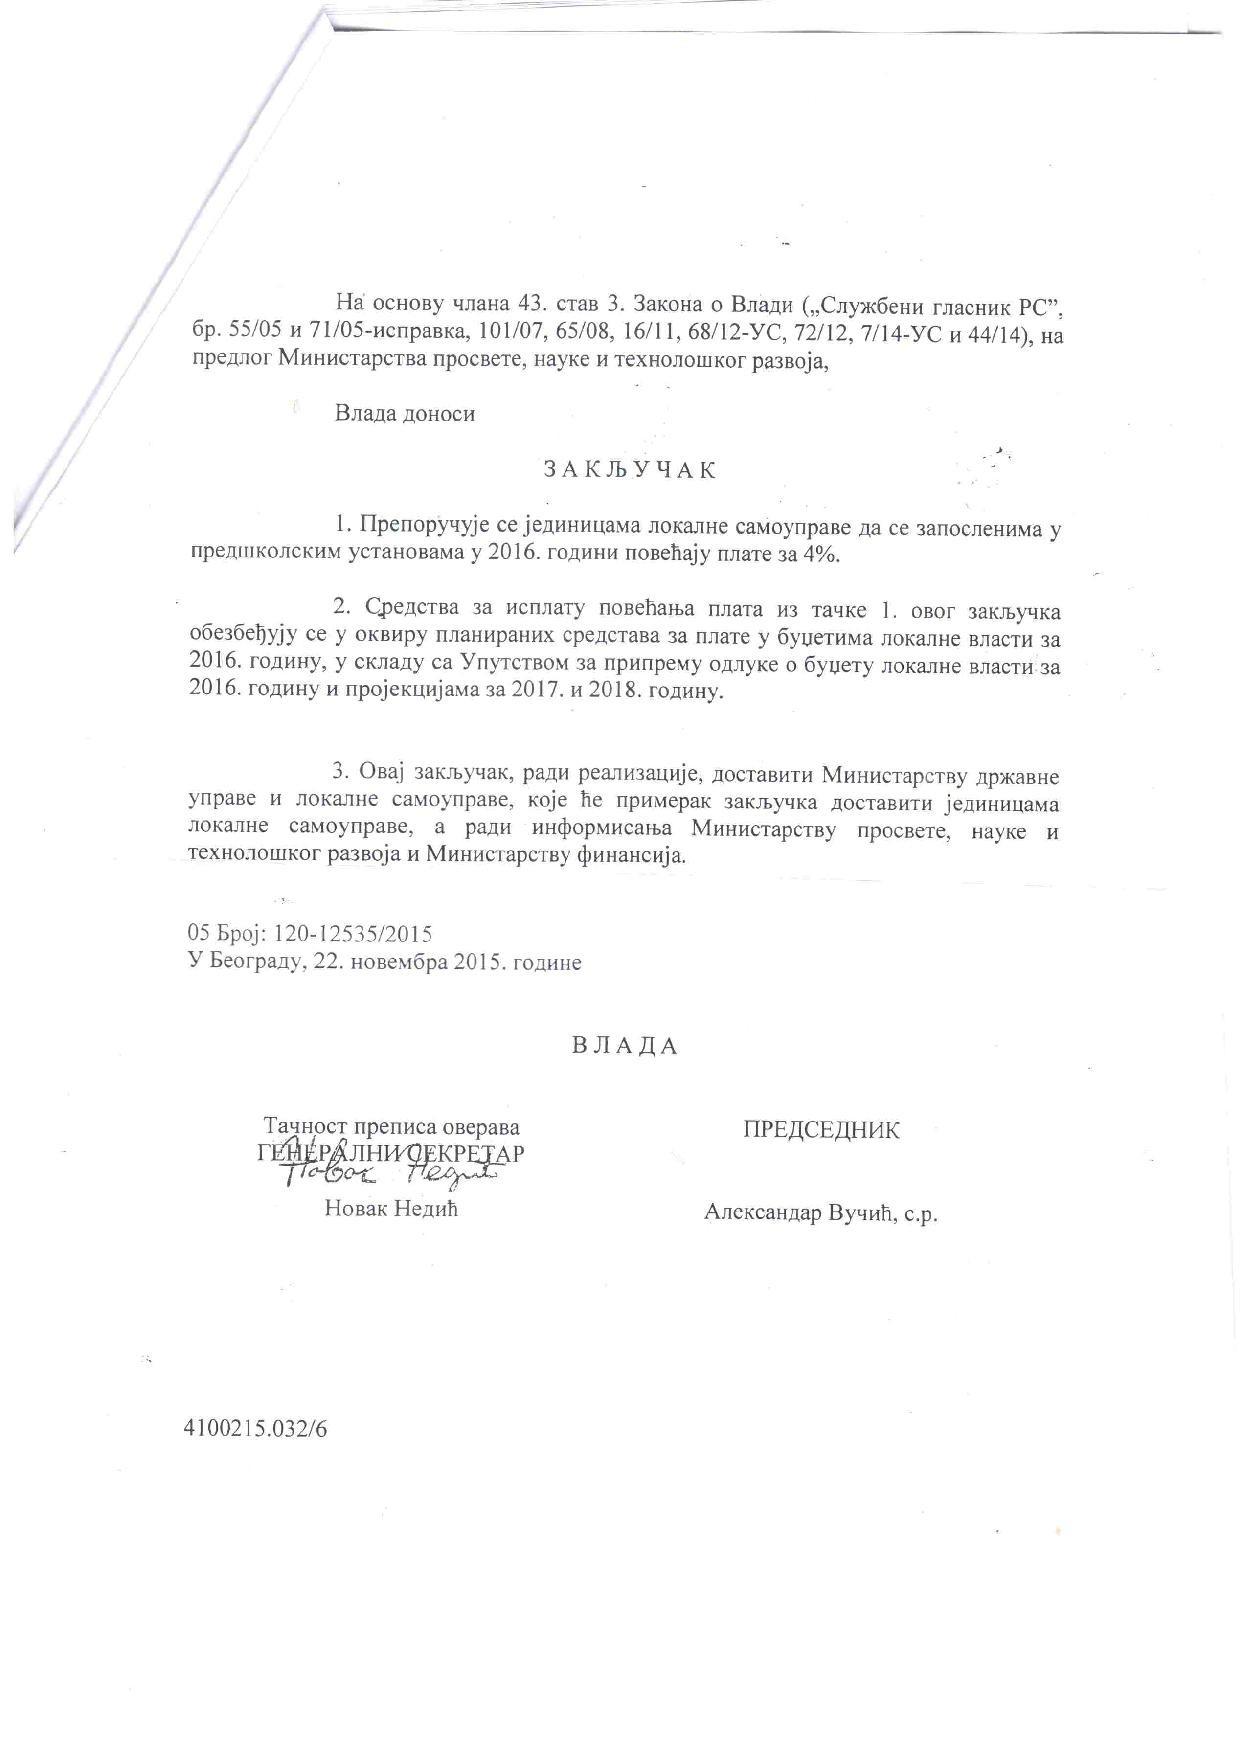 5. Dopis Ministra prosvete u vezi sa PU 22.12.2015-page-005